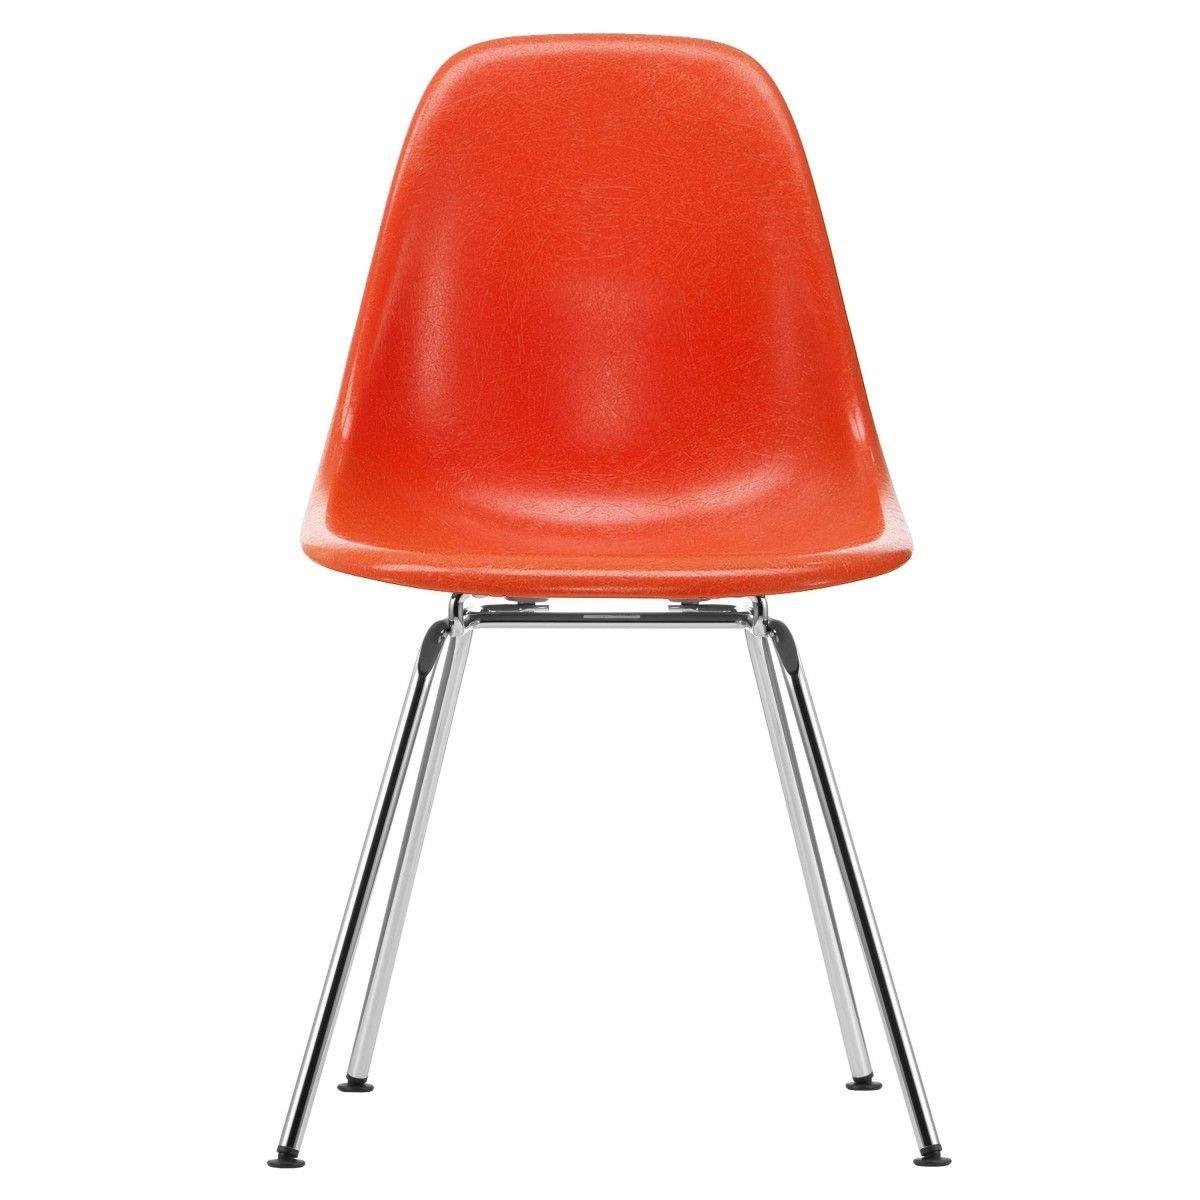 Vitra Eames Fiberglass Chair DSX - Red Orange/Chroom